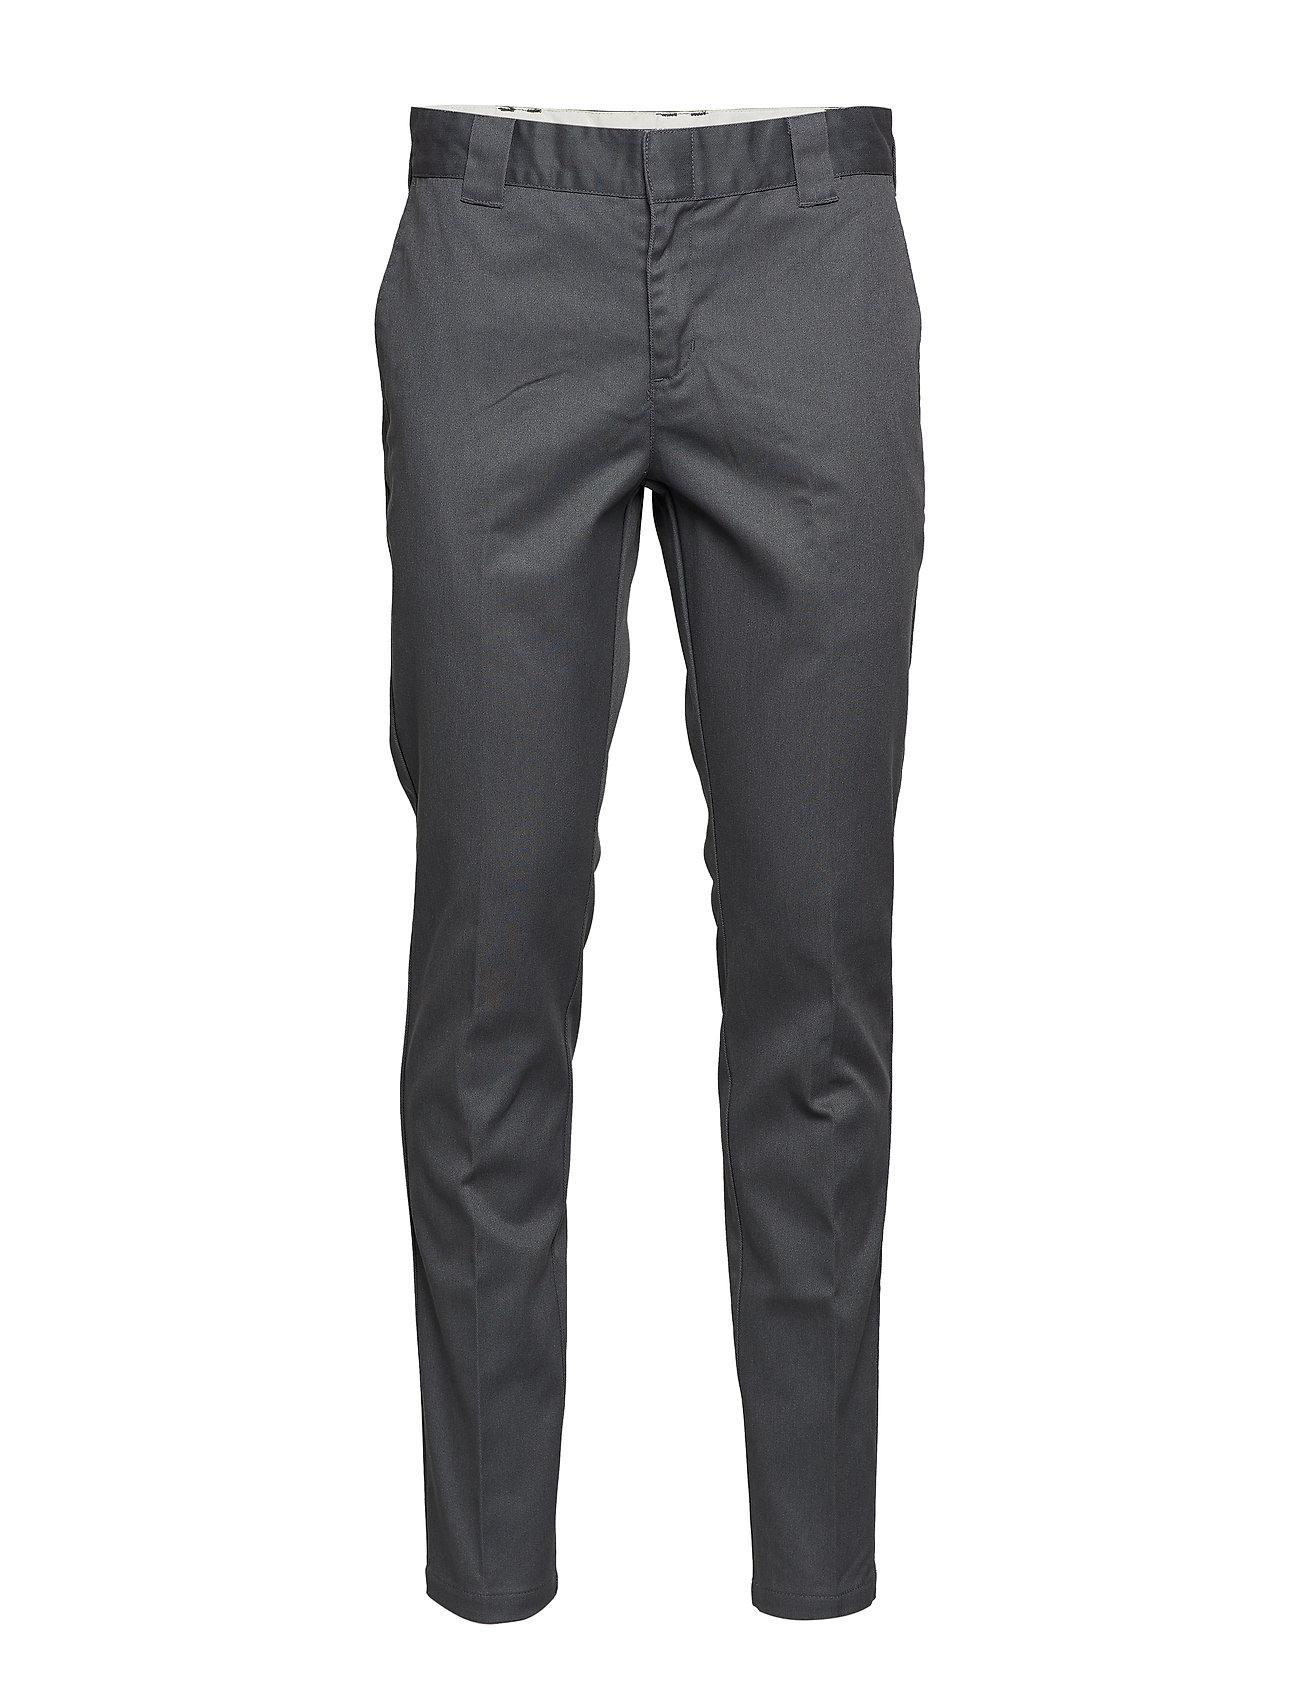 Dickies Slim Fit Work Pant - CHARCOAL GREY